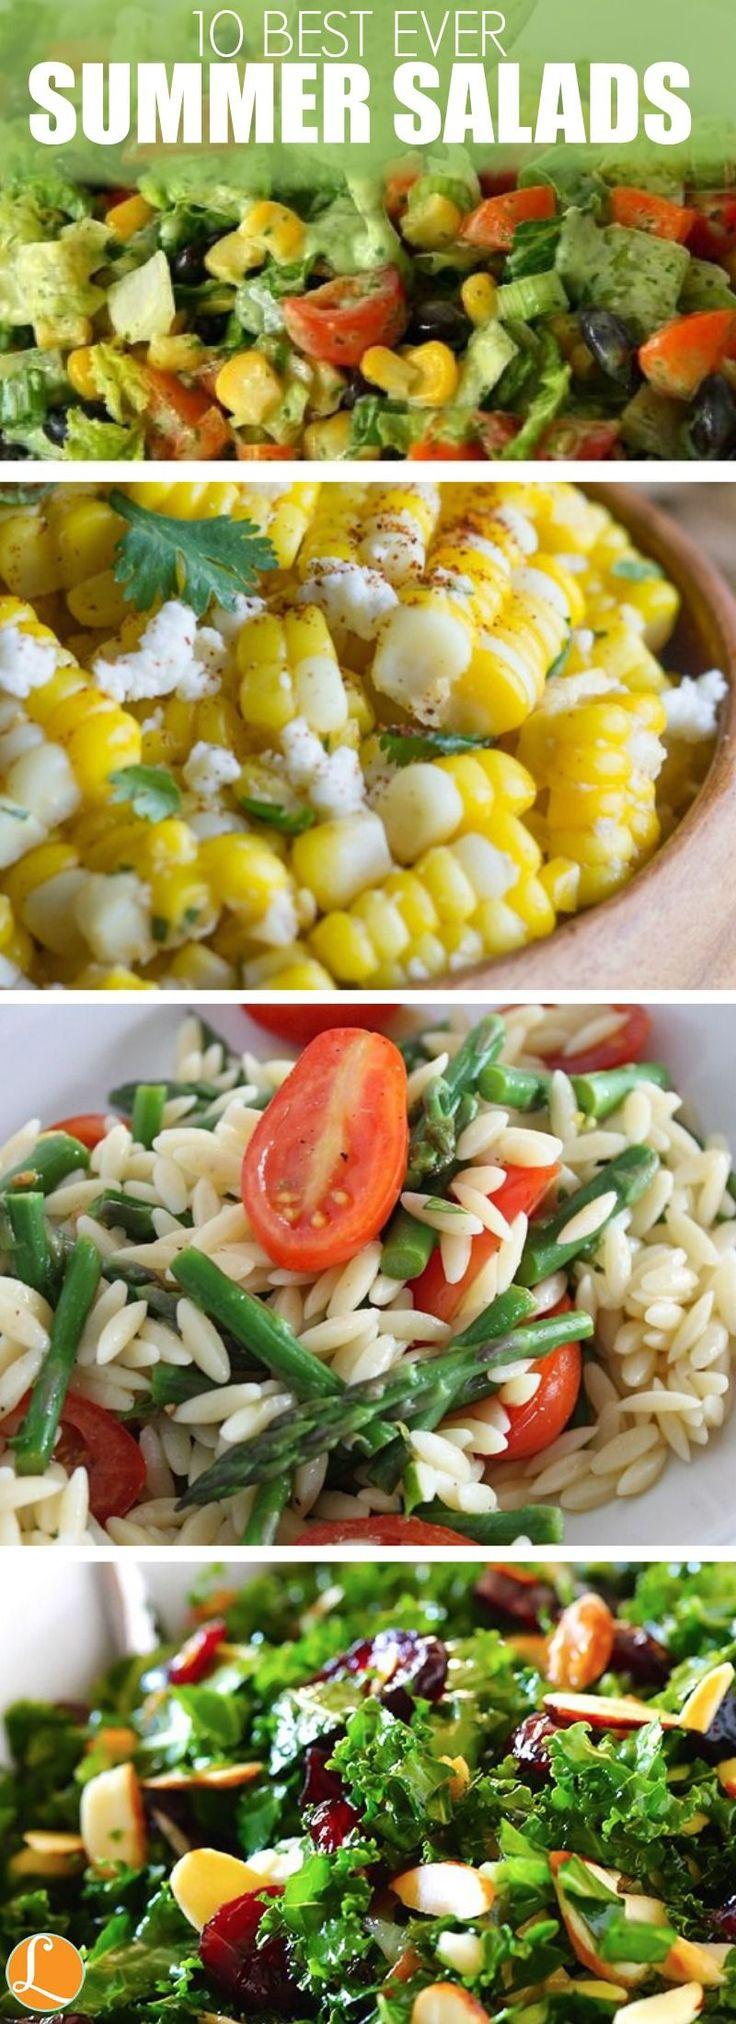 10 Best Ever Summer Salads